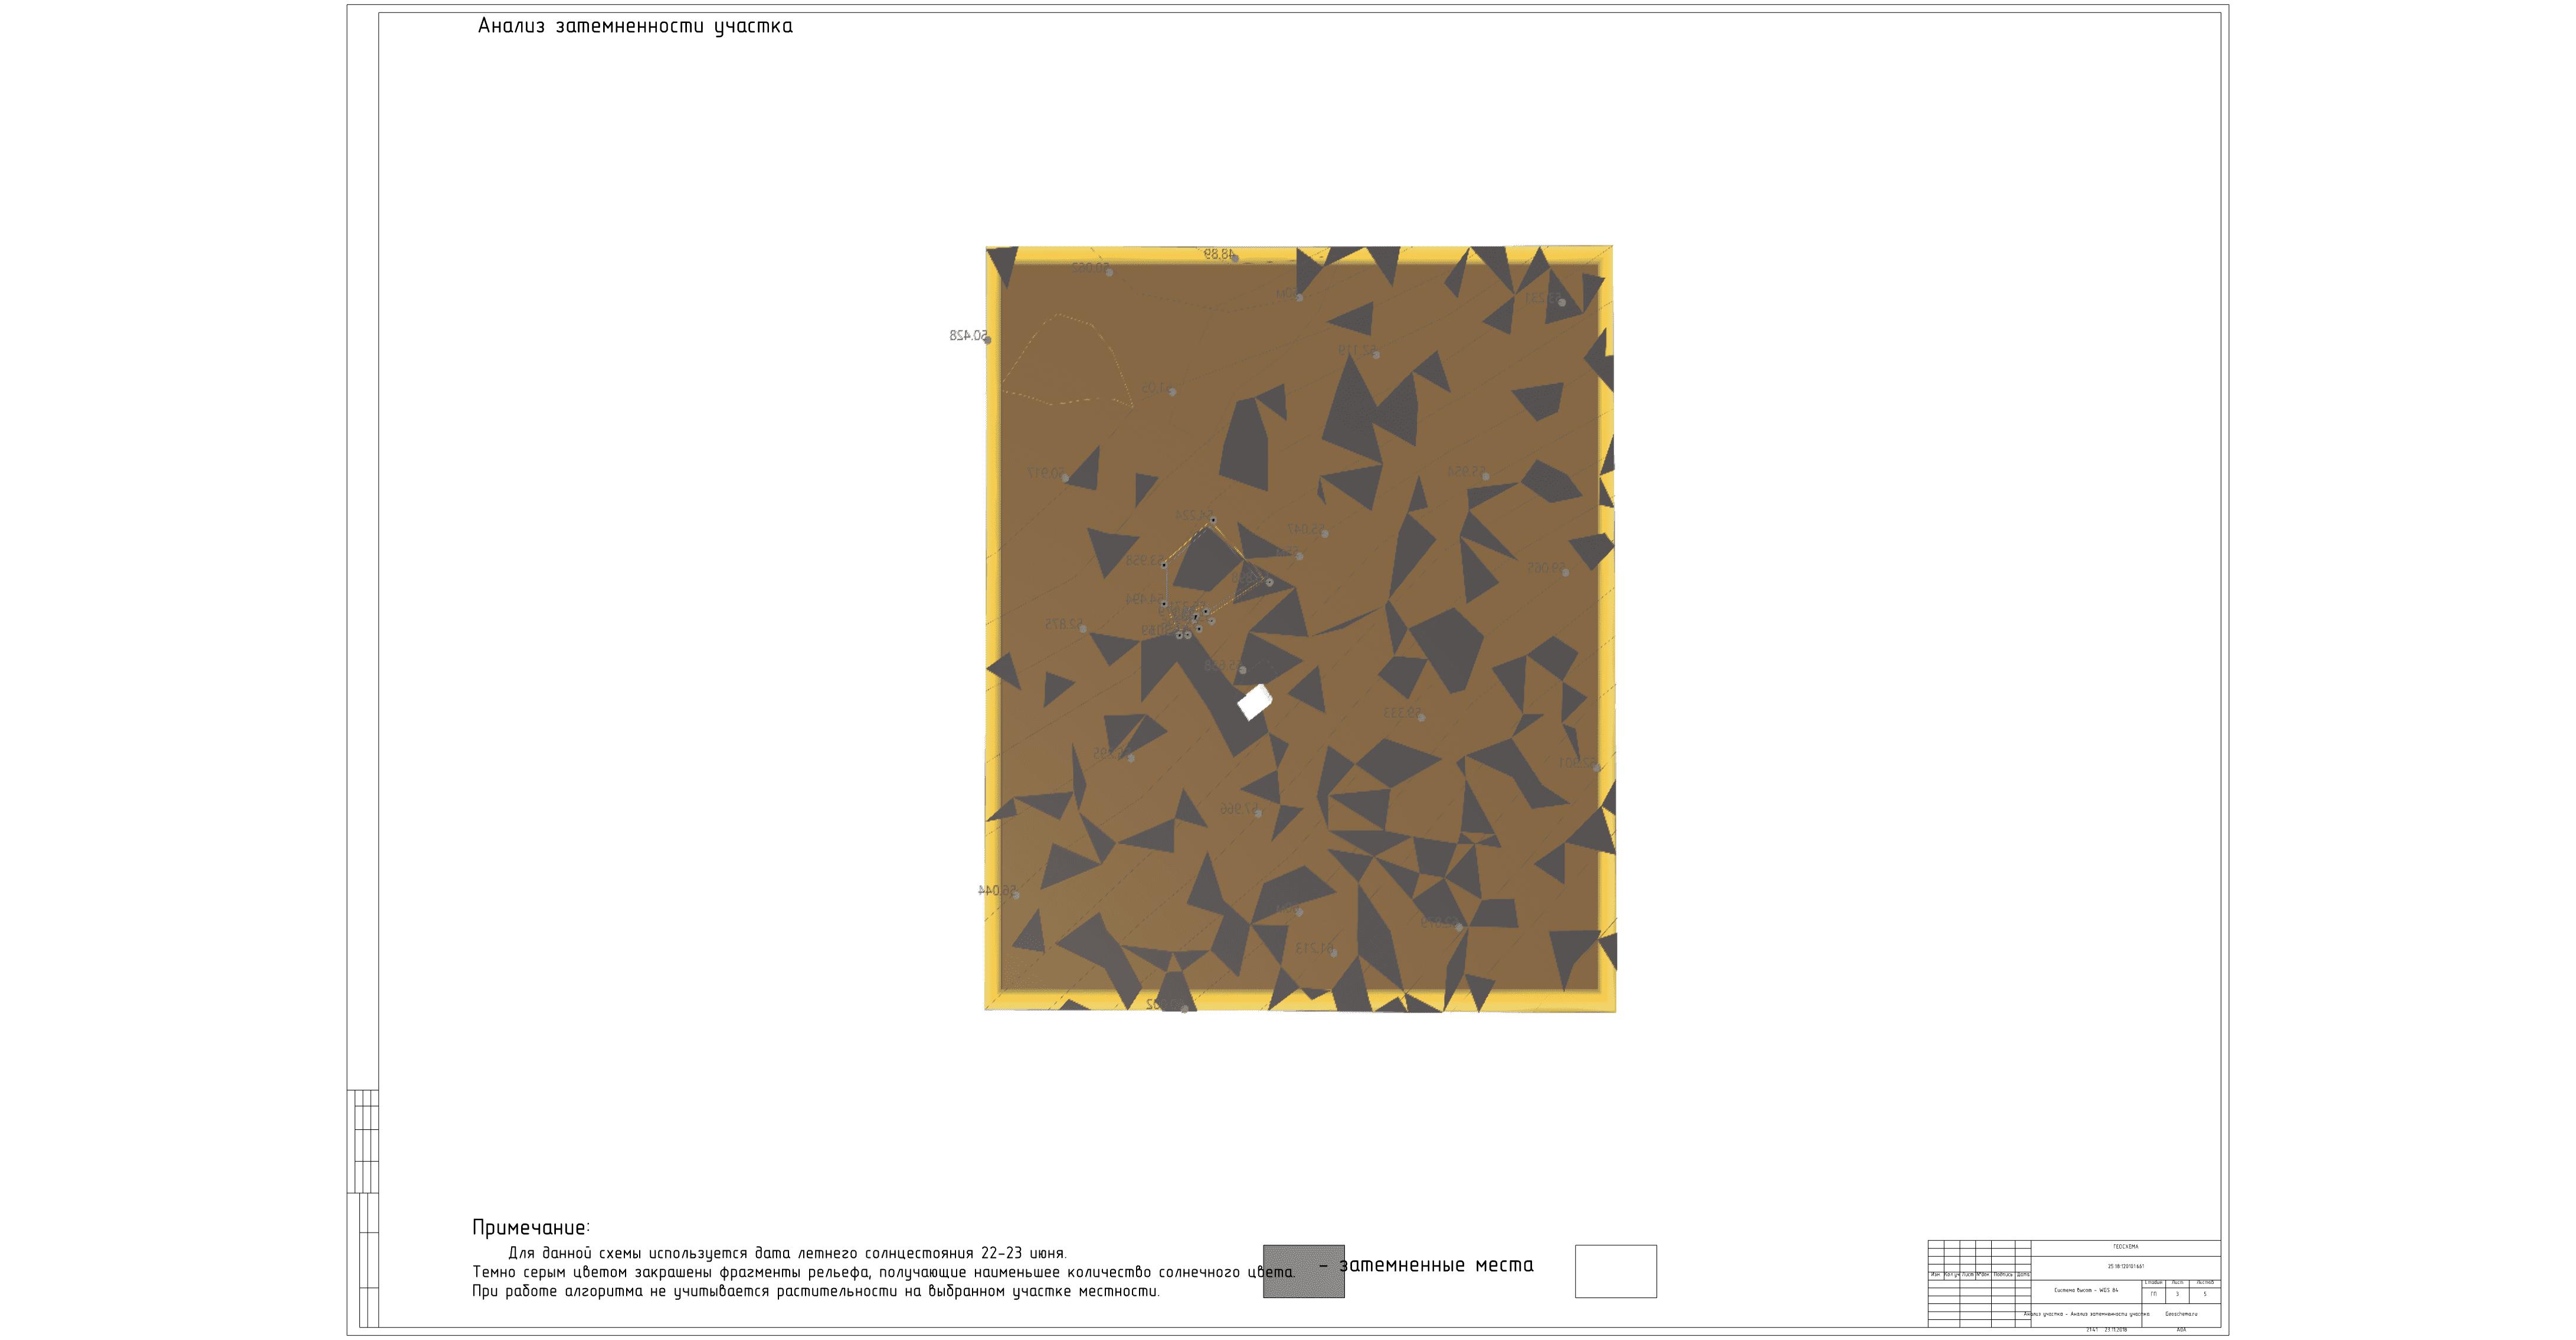 9 Анализ затемненности участка.png